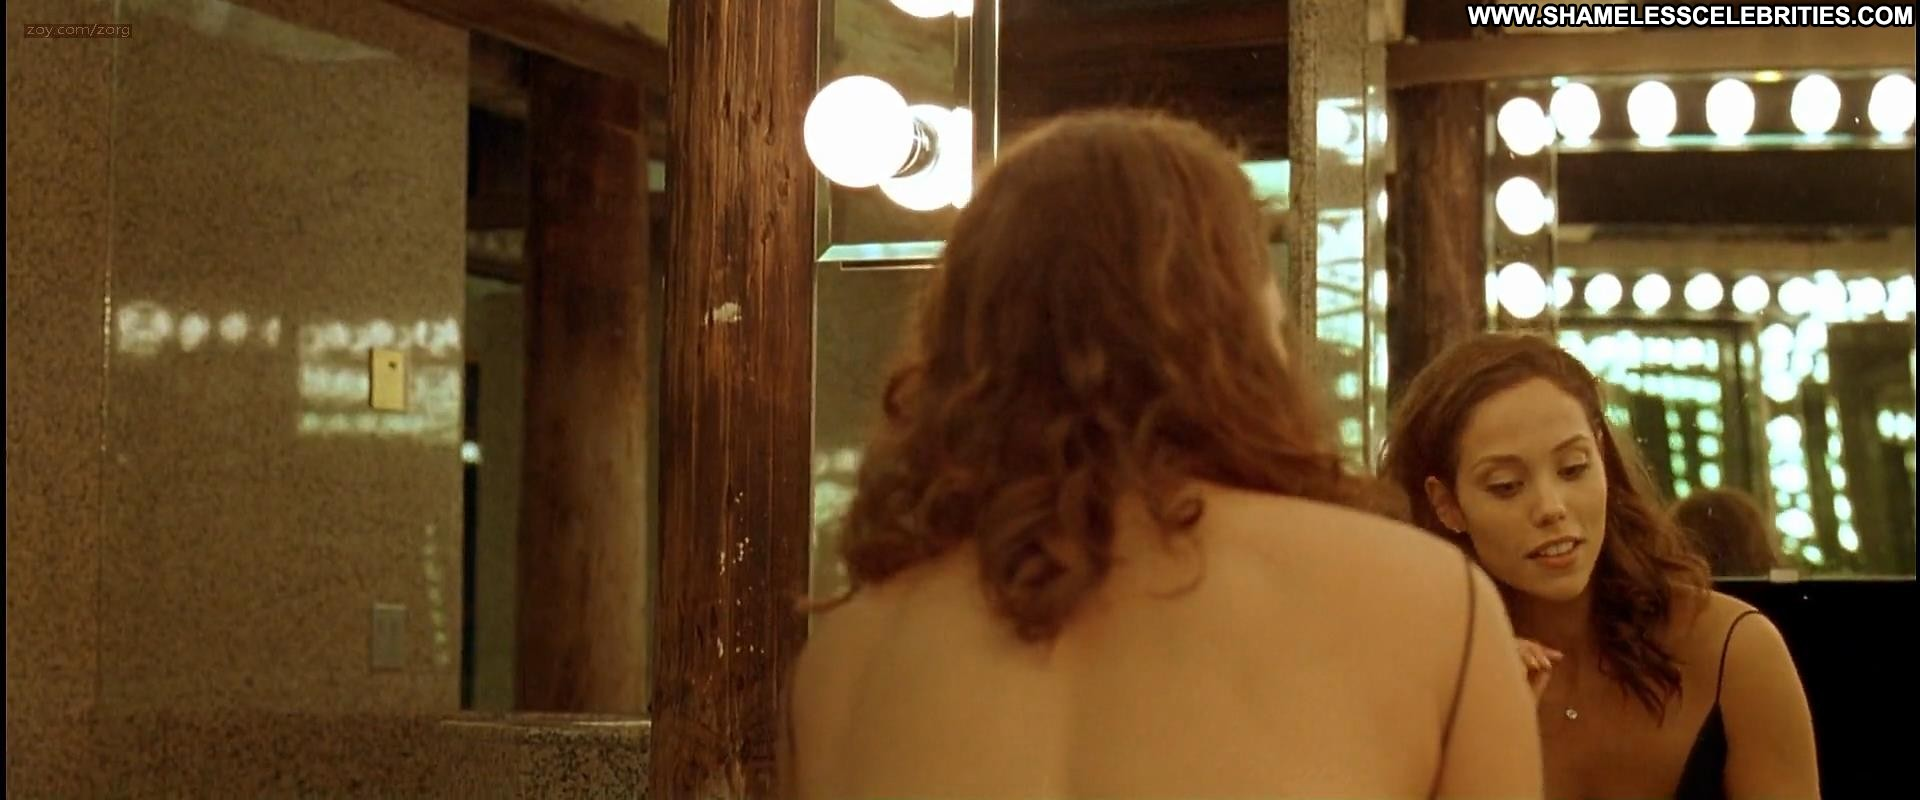 Elizabeth Berkley Any Given Sunday Any Given Sunday Beautiful Celebrity Sexy Nude Scene